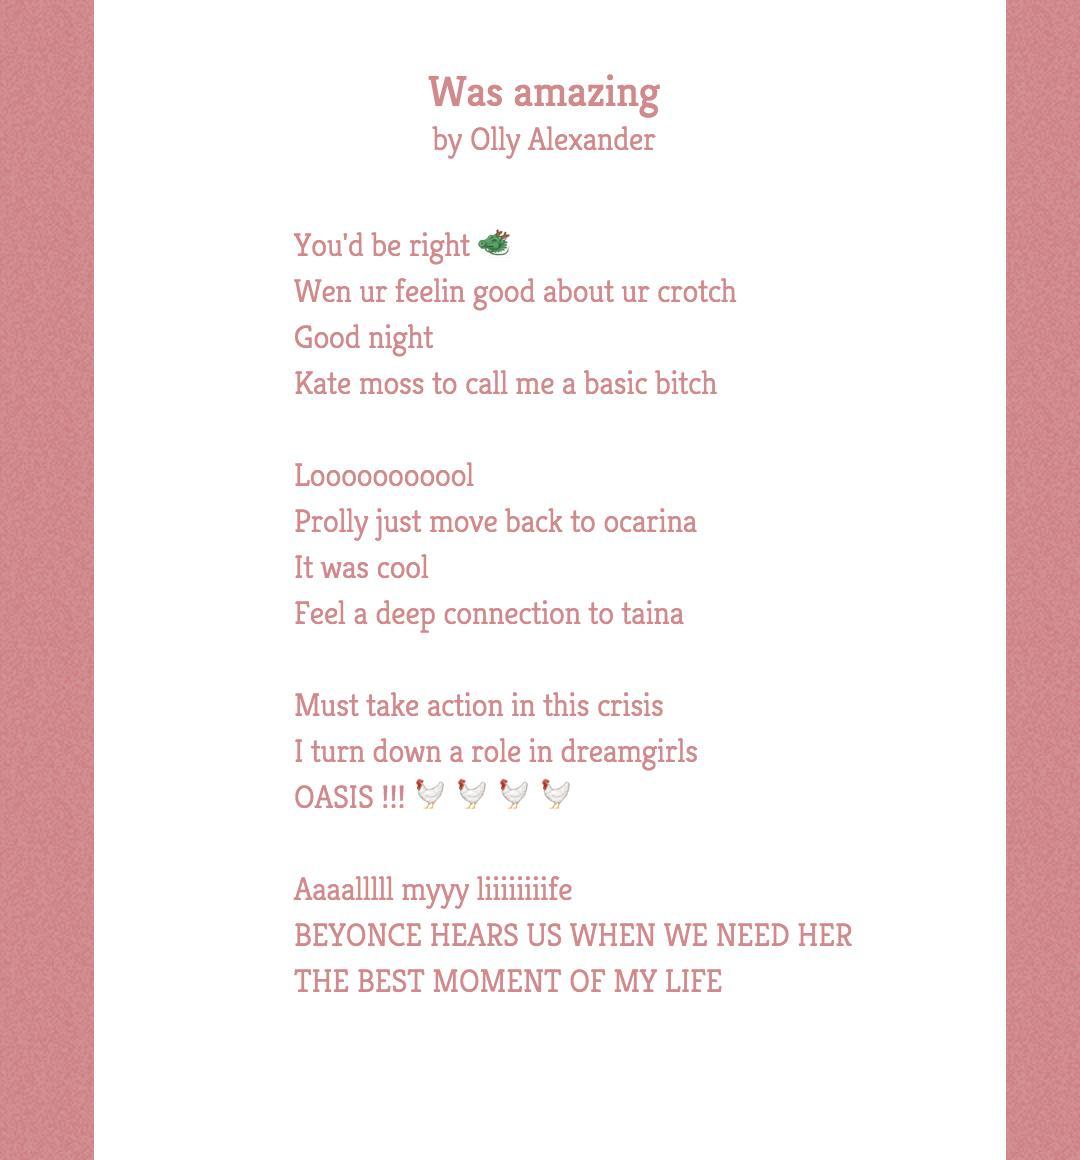 olly poem